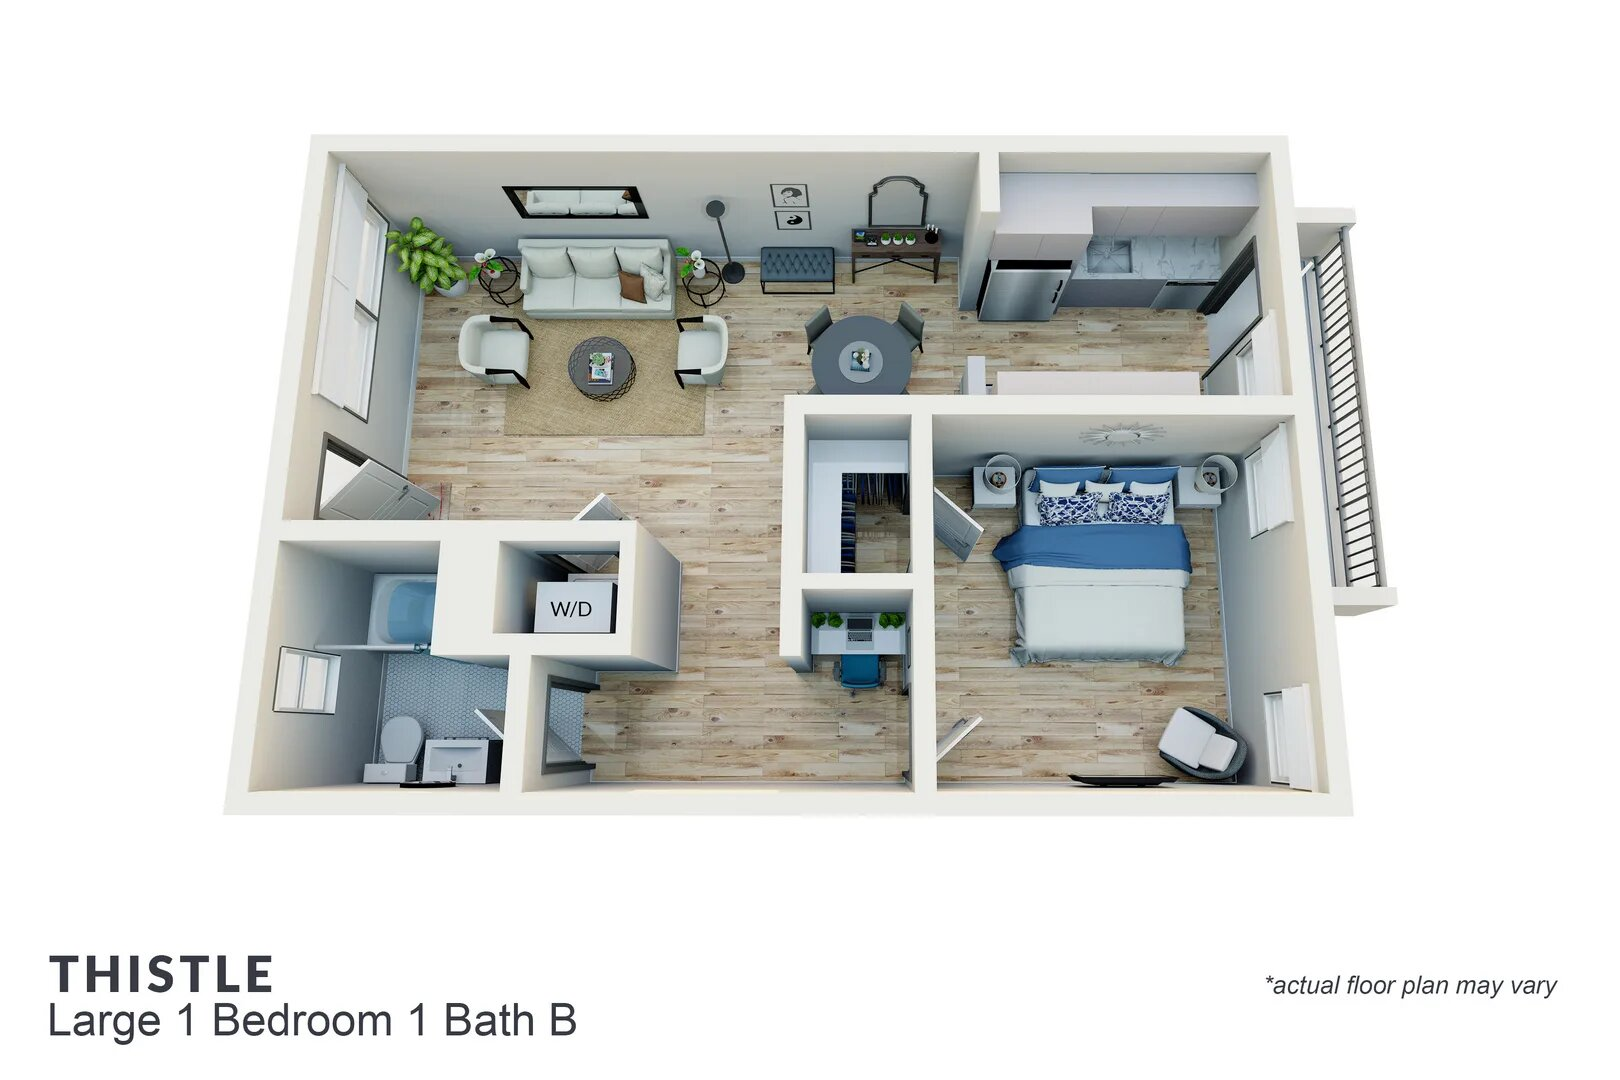 Thistle large 1 bedroom 1 bath B